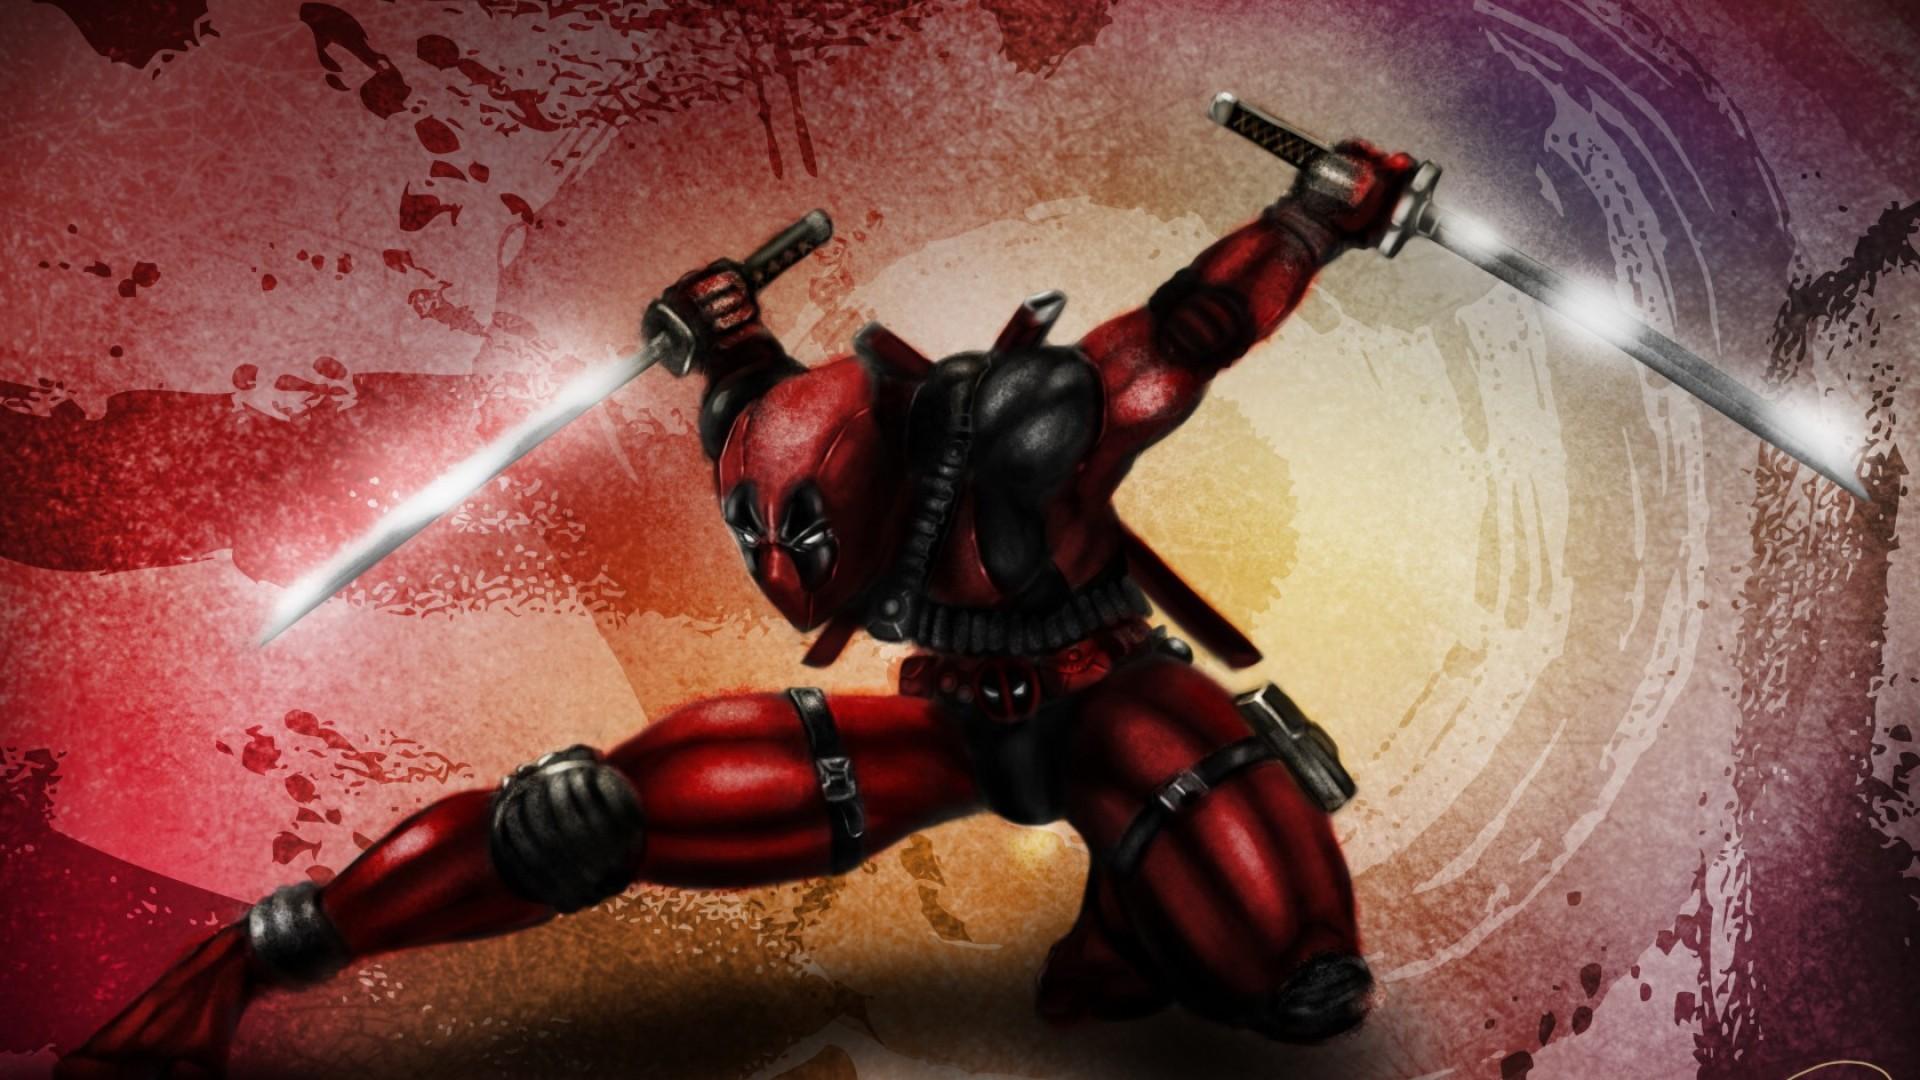 Res: 1920x1080, Deadpool High moon studios Mask Gun Red suit Full HD 1080p HD